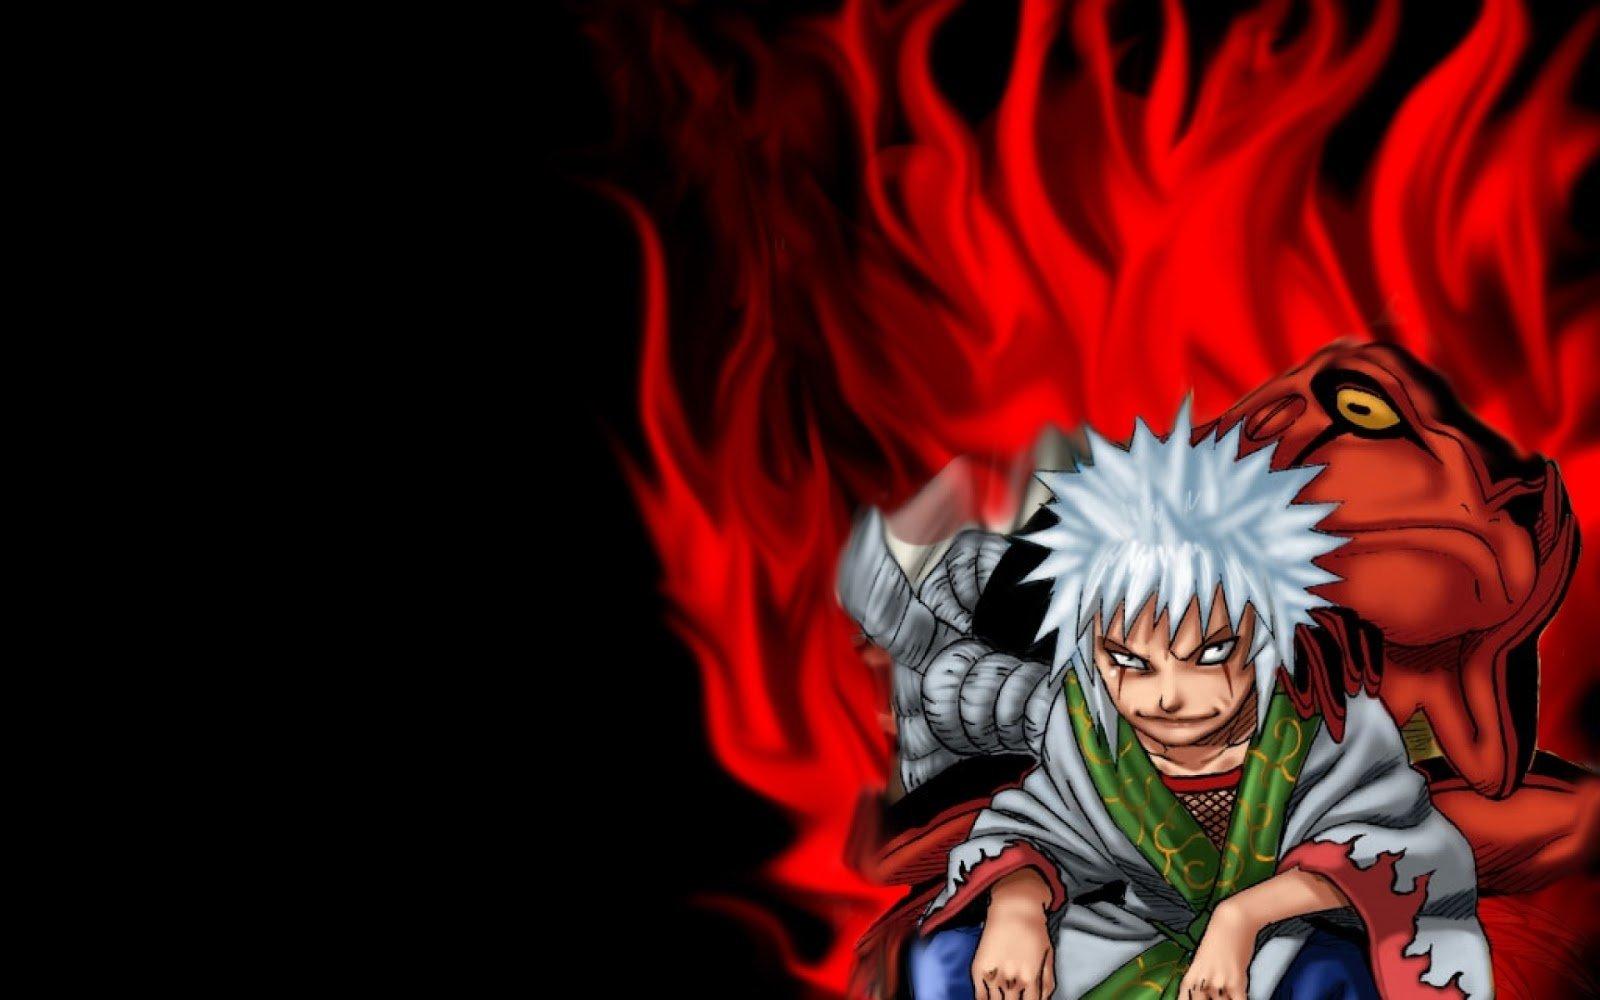 Cool Naruto Anime Wallpaper HDQ Wallpapers 1600x1000